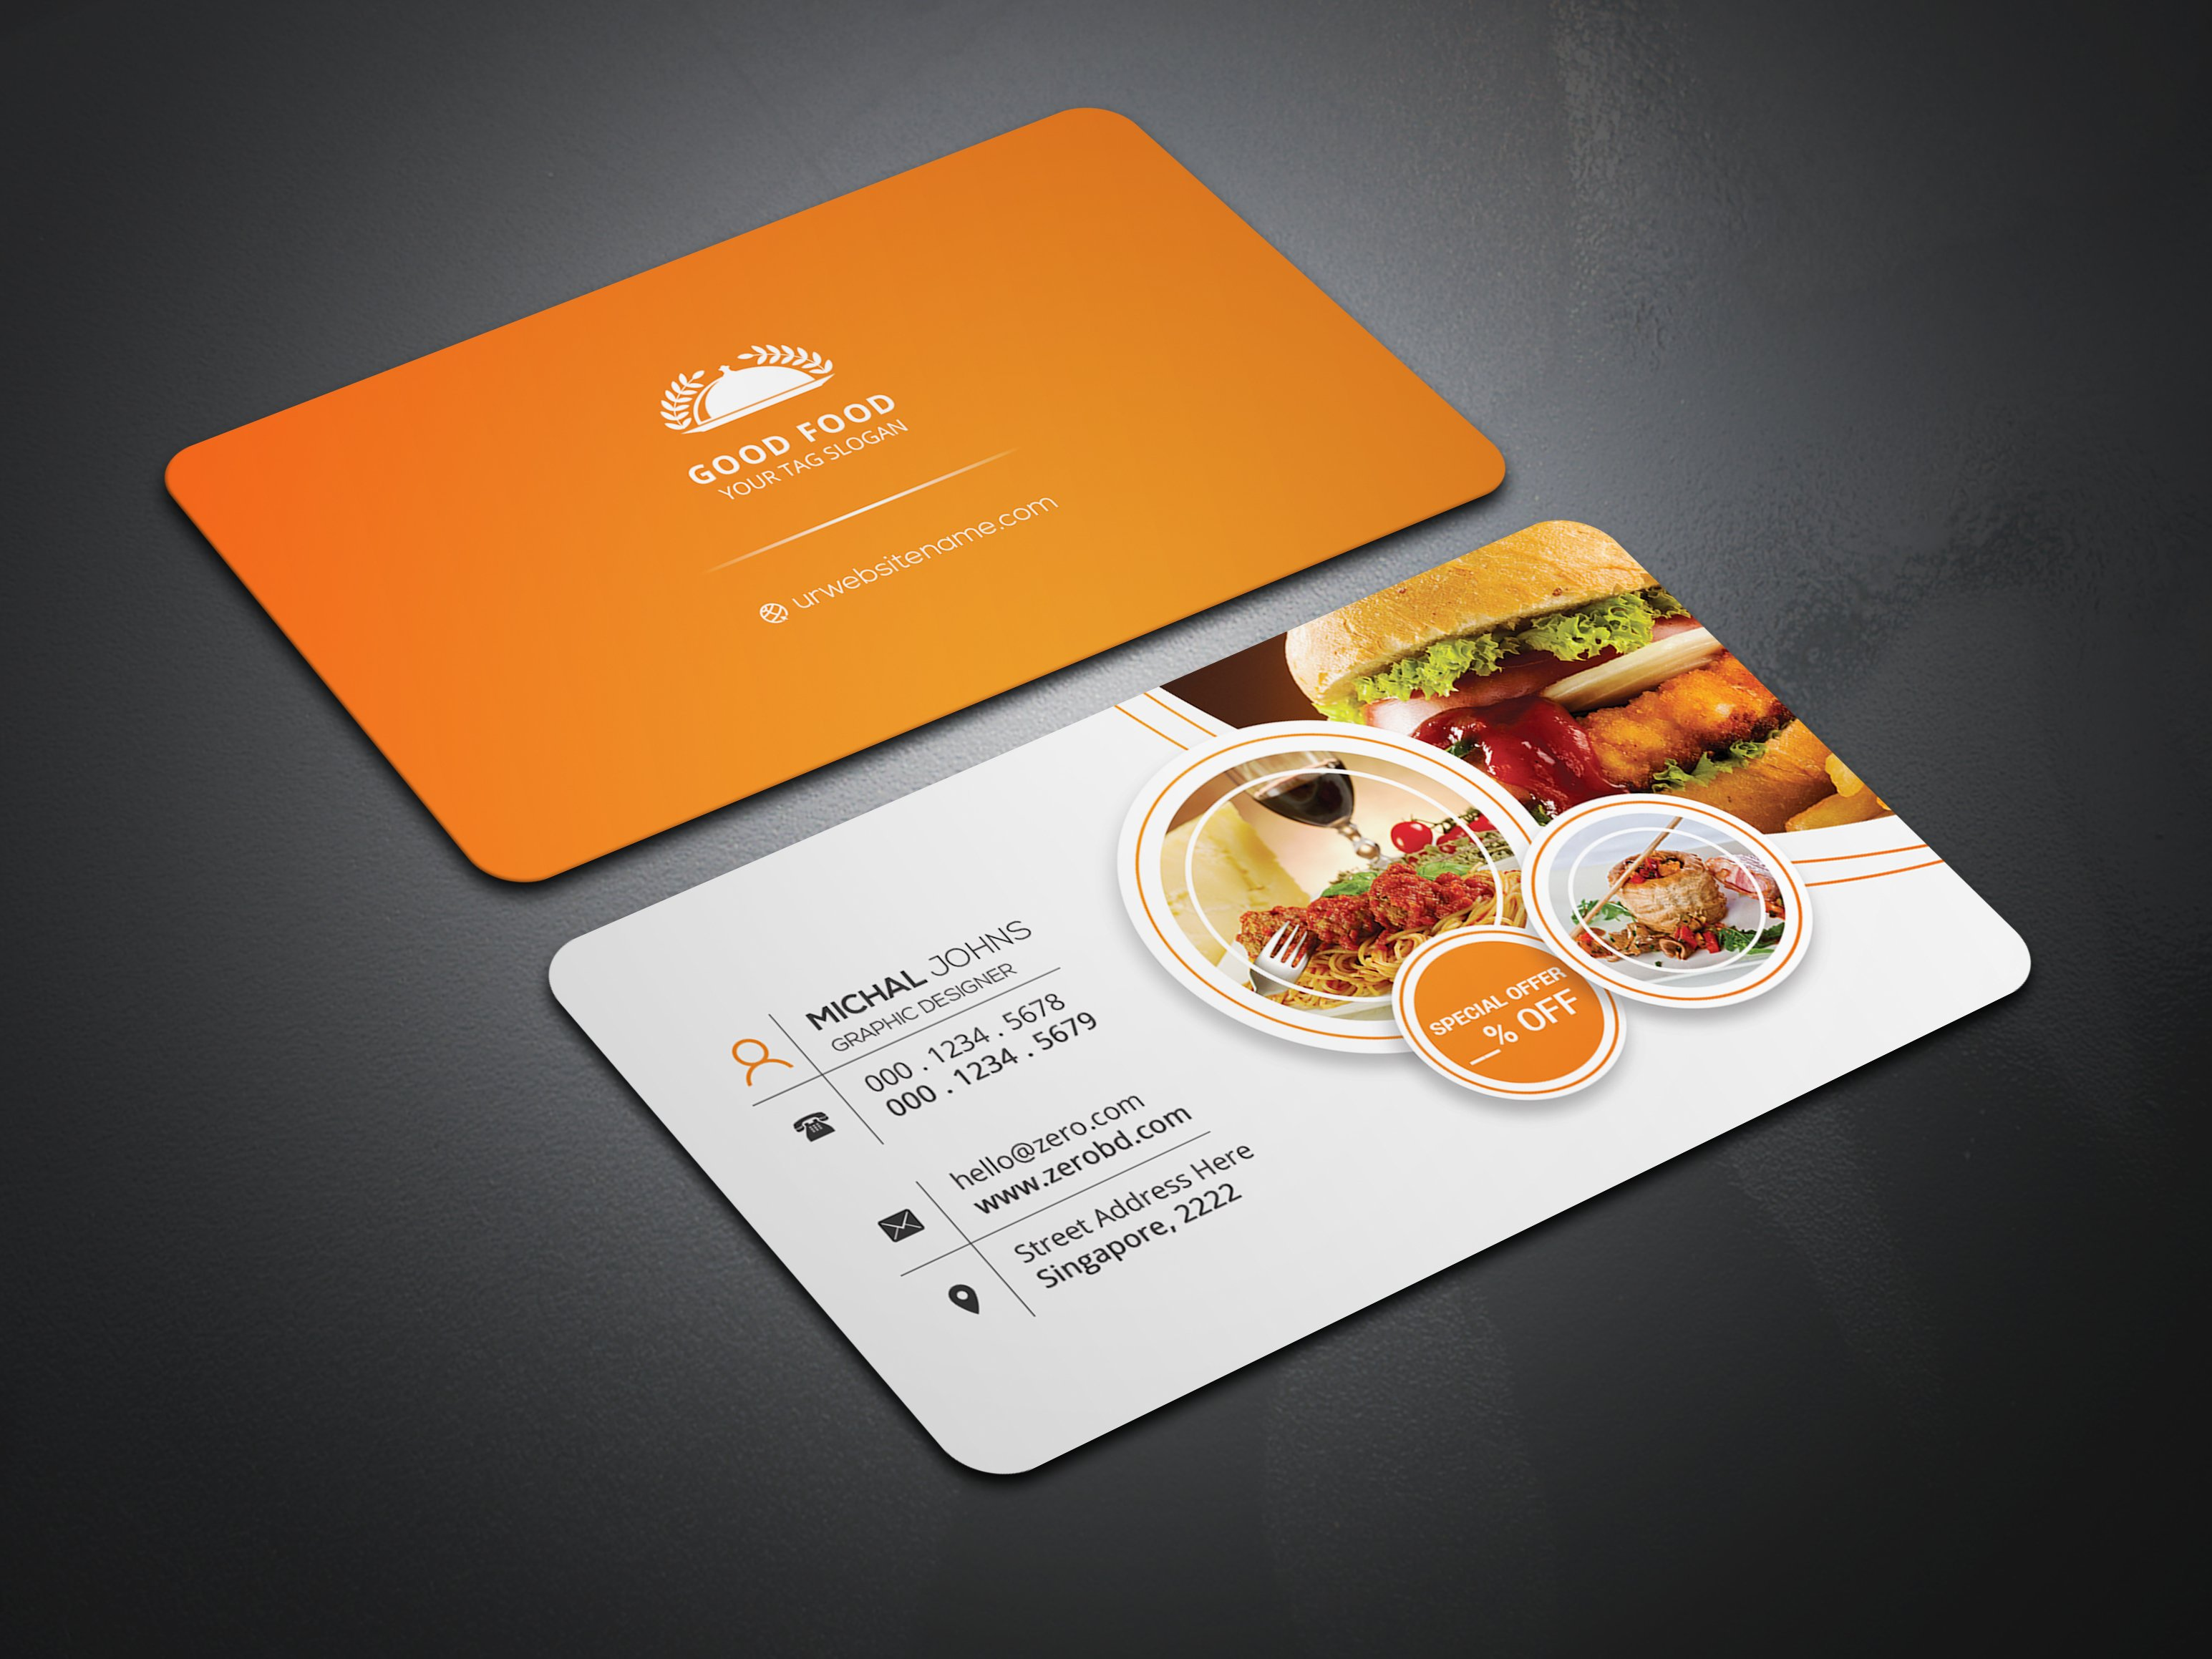 restaurant business card business card templates creative market. Black Bedroom Furniture Sets. Home Design Ideas